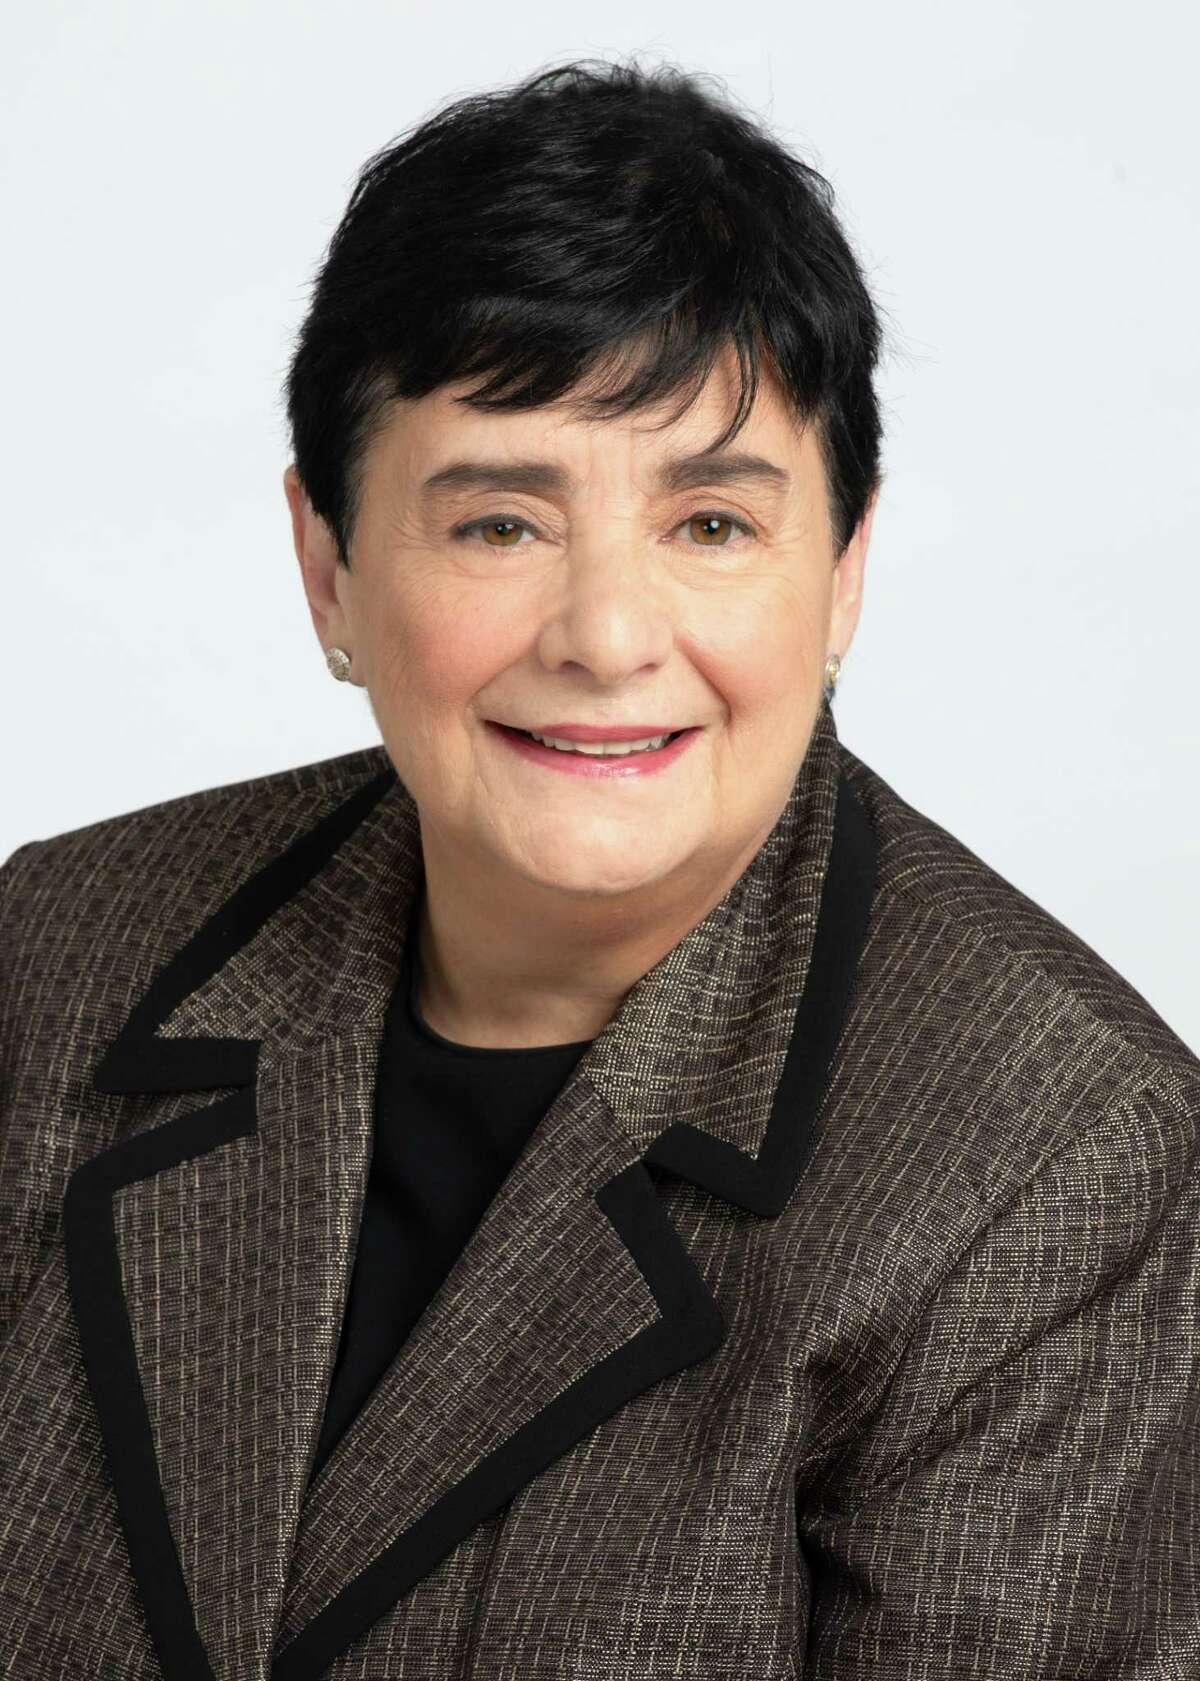 Mary Lou Rinaldi, Stamford Board of Finance candidate